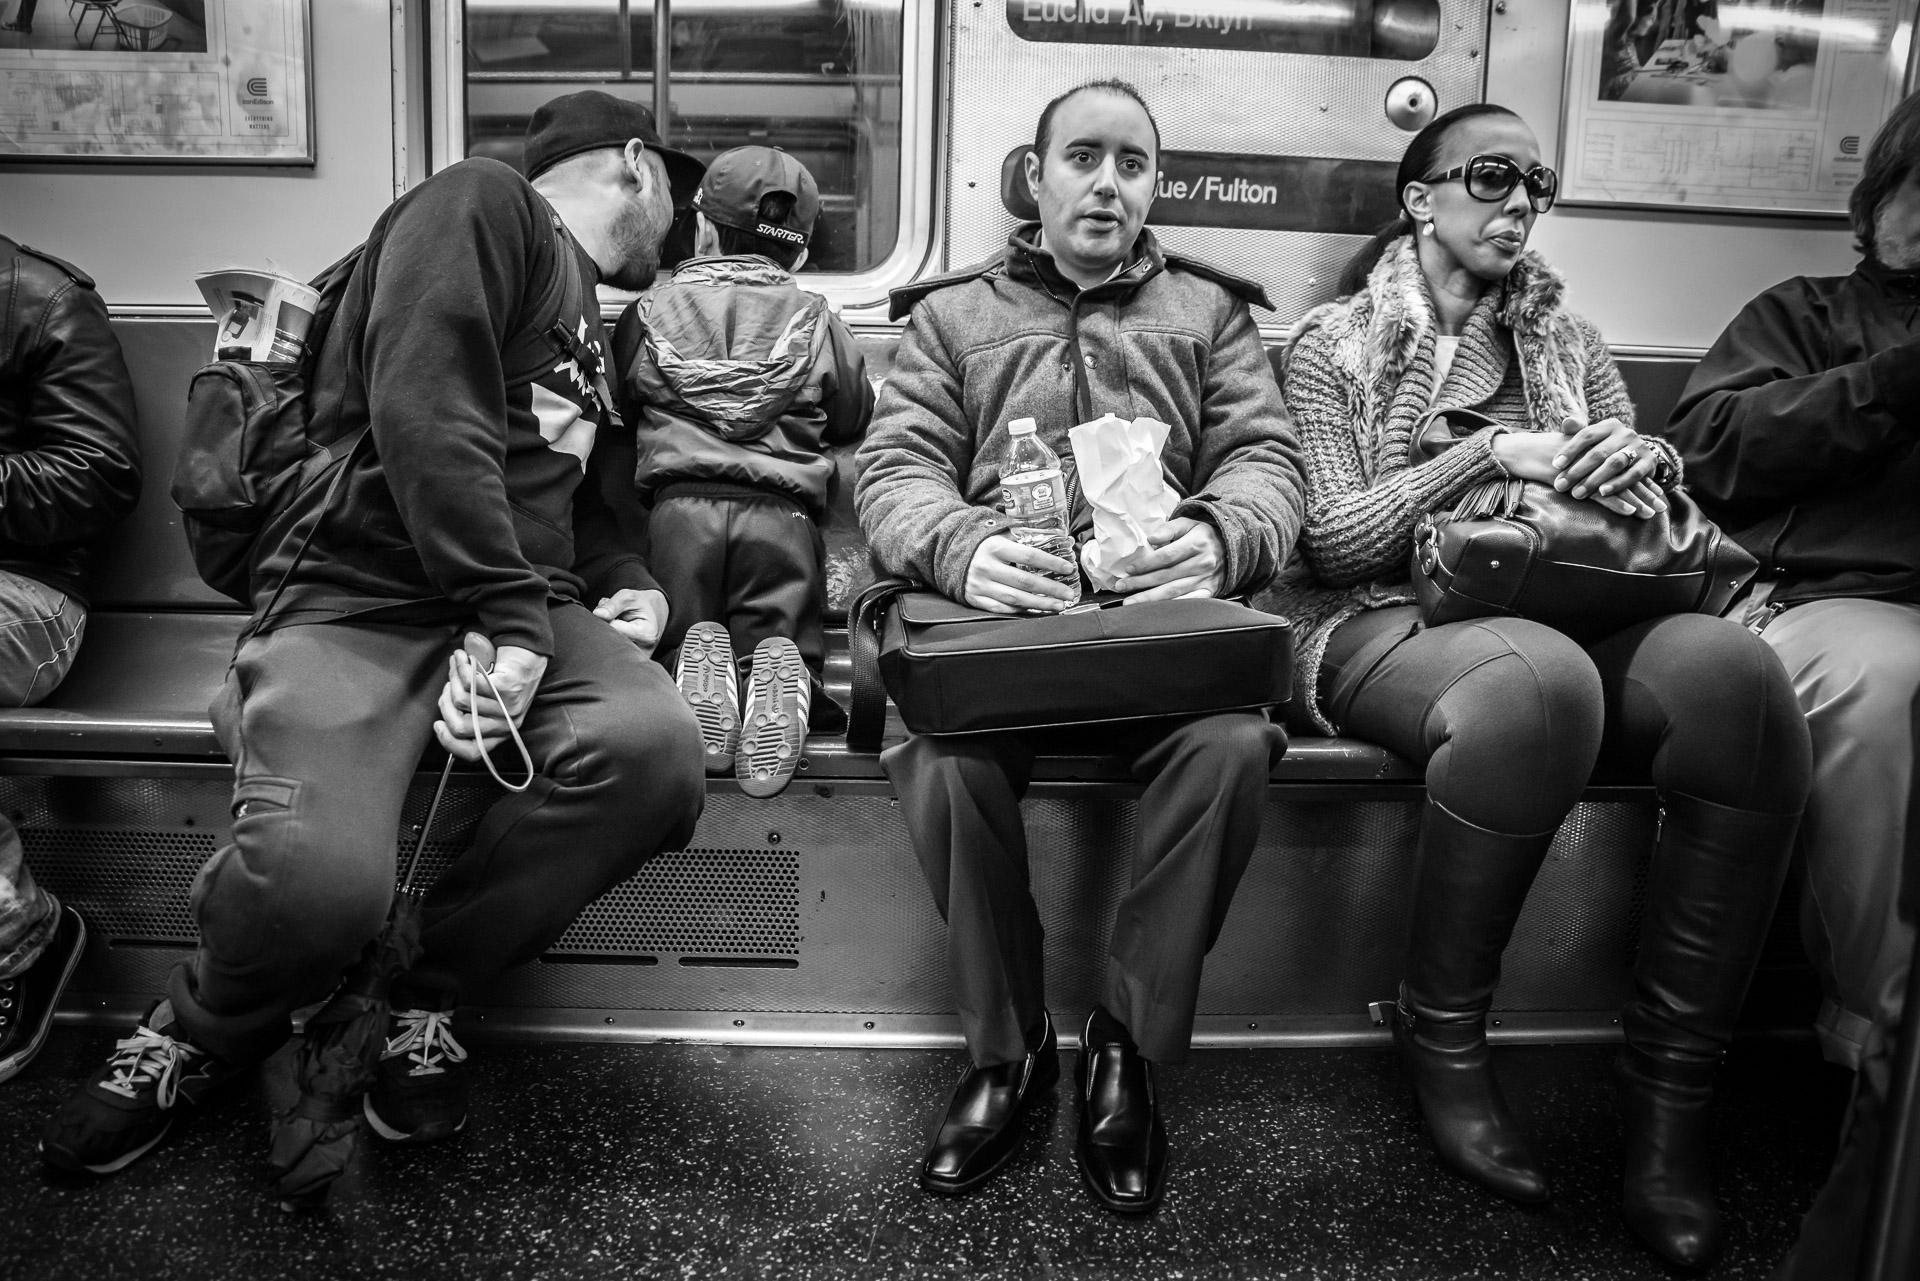 Subway Scene by niklin1